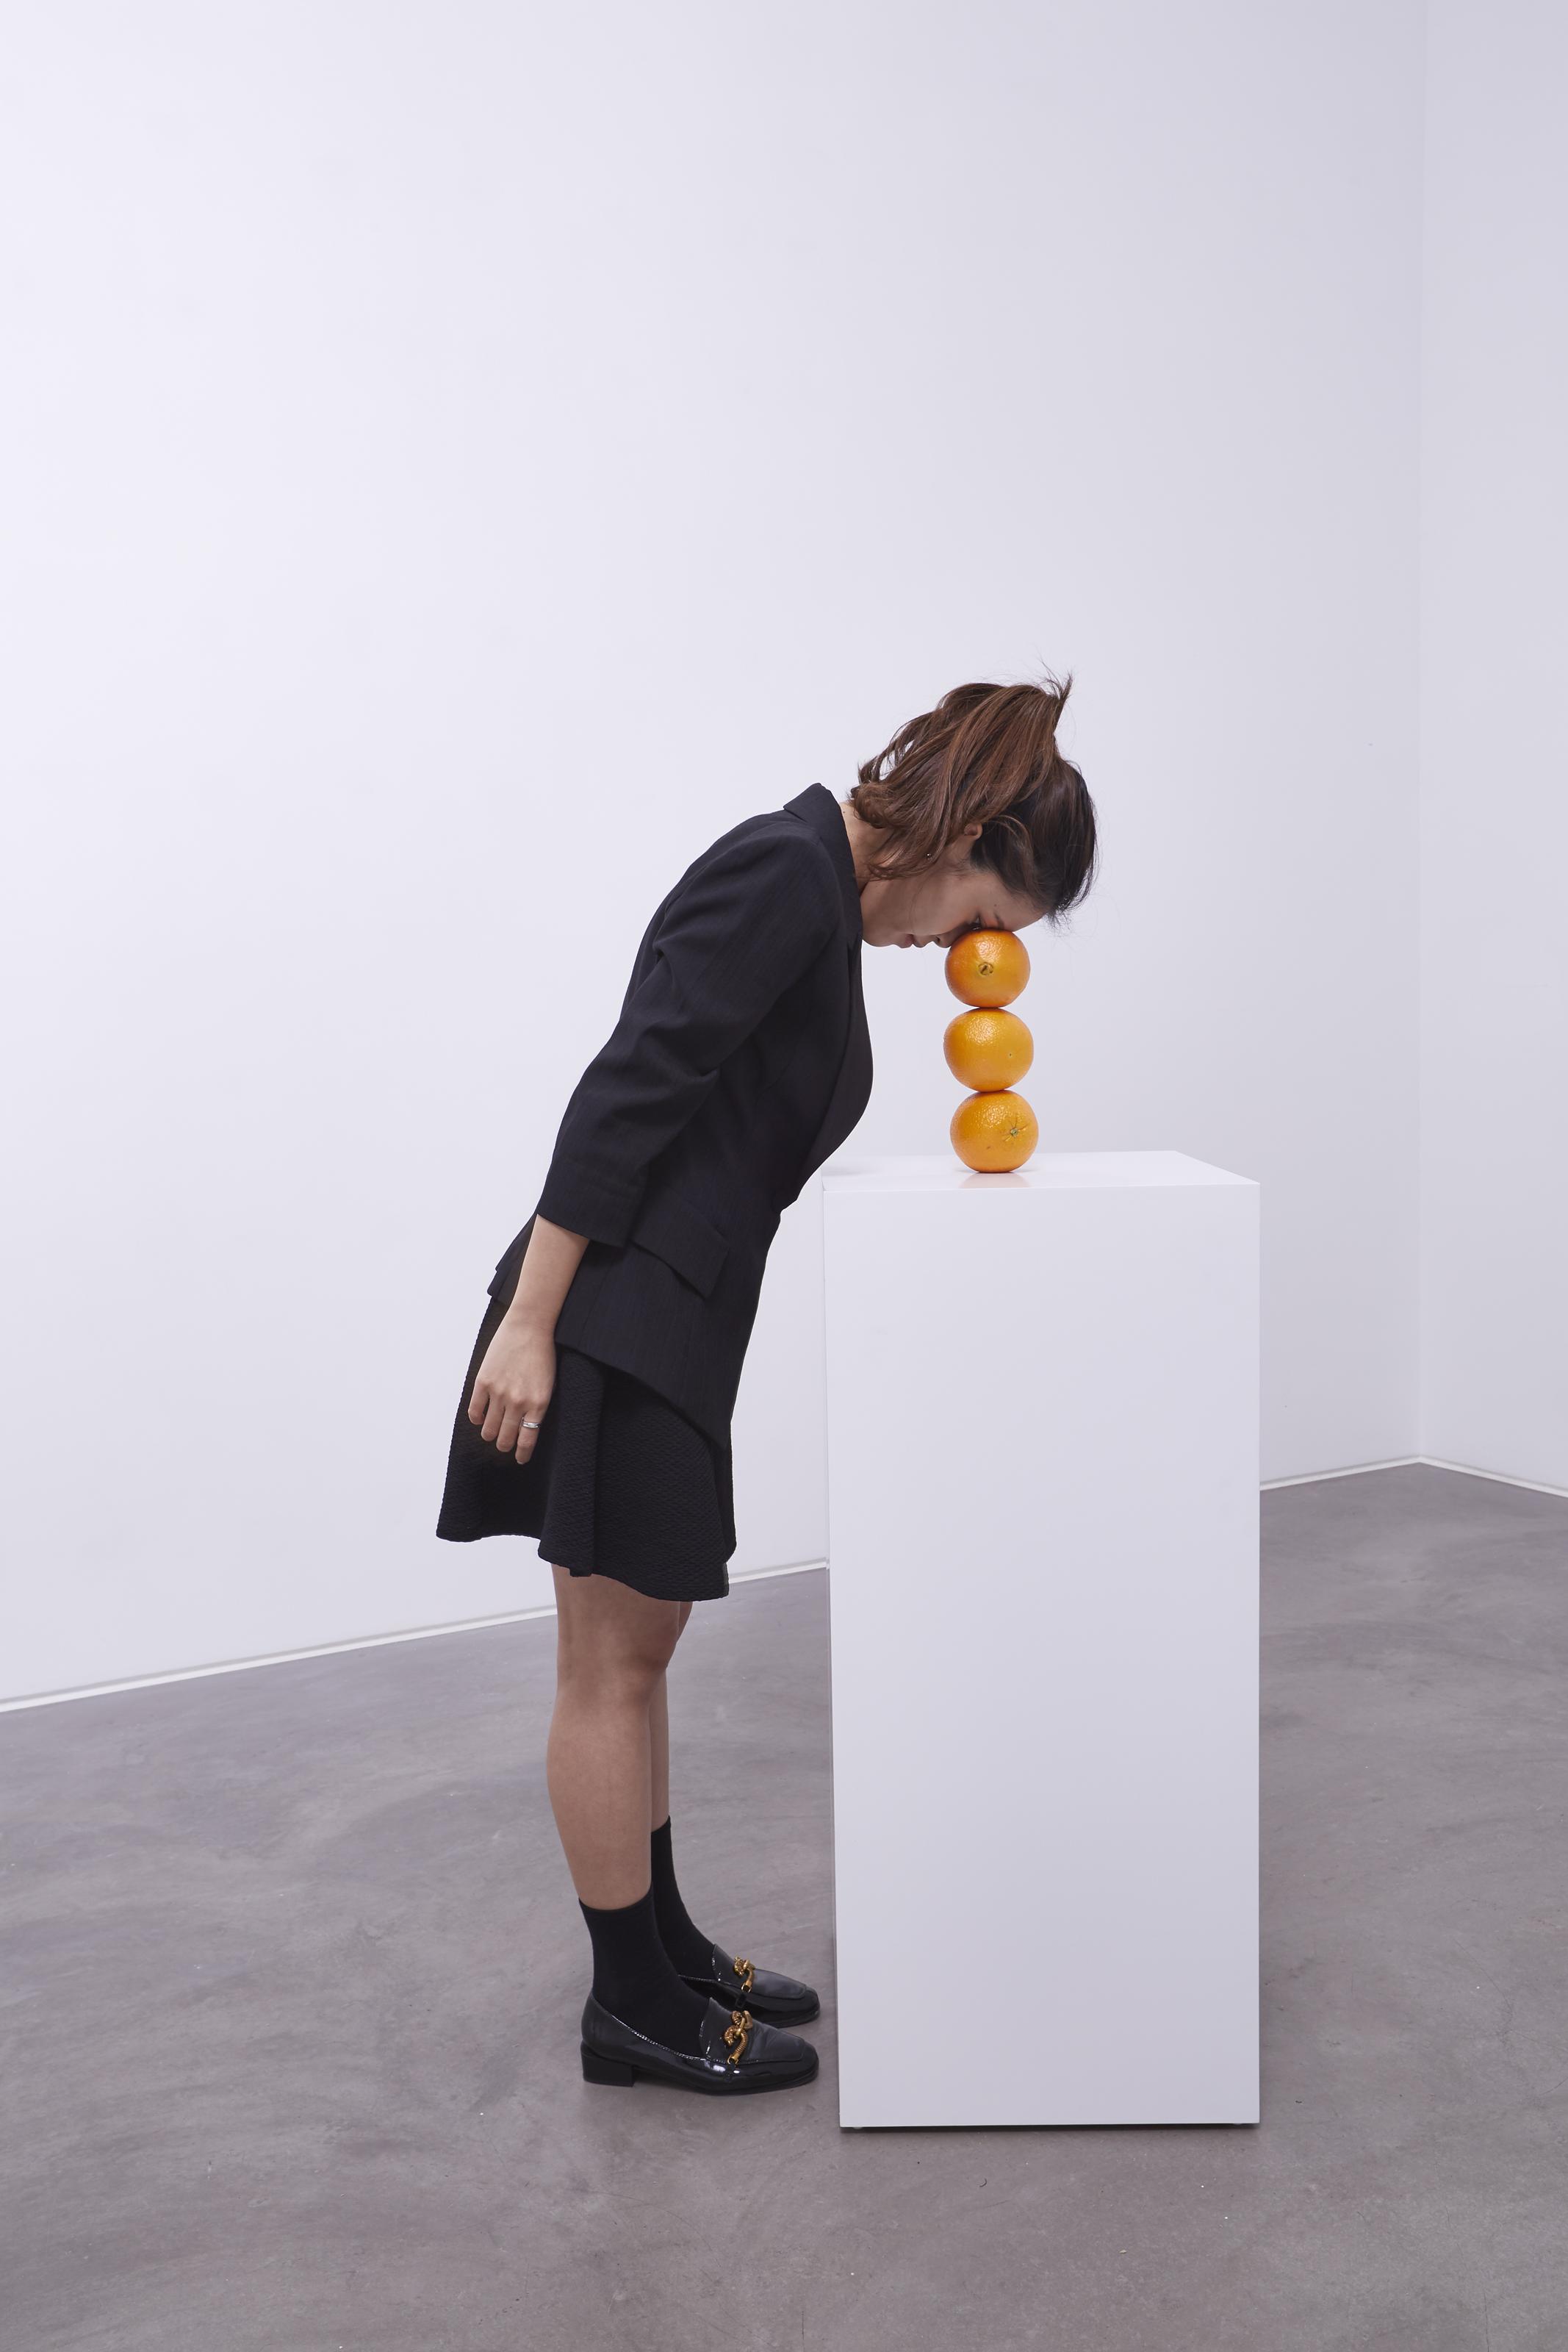 Inside Erwin Wurm's 'absurd' sculptures last just 60 seconds